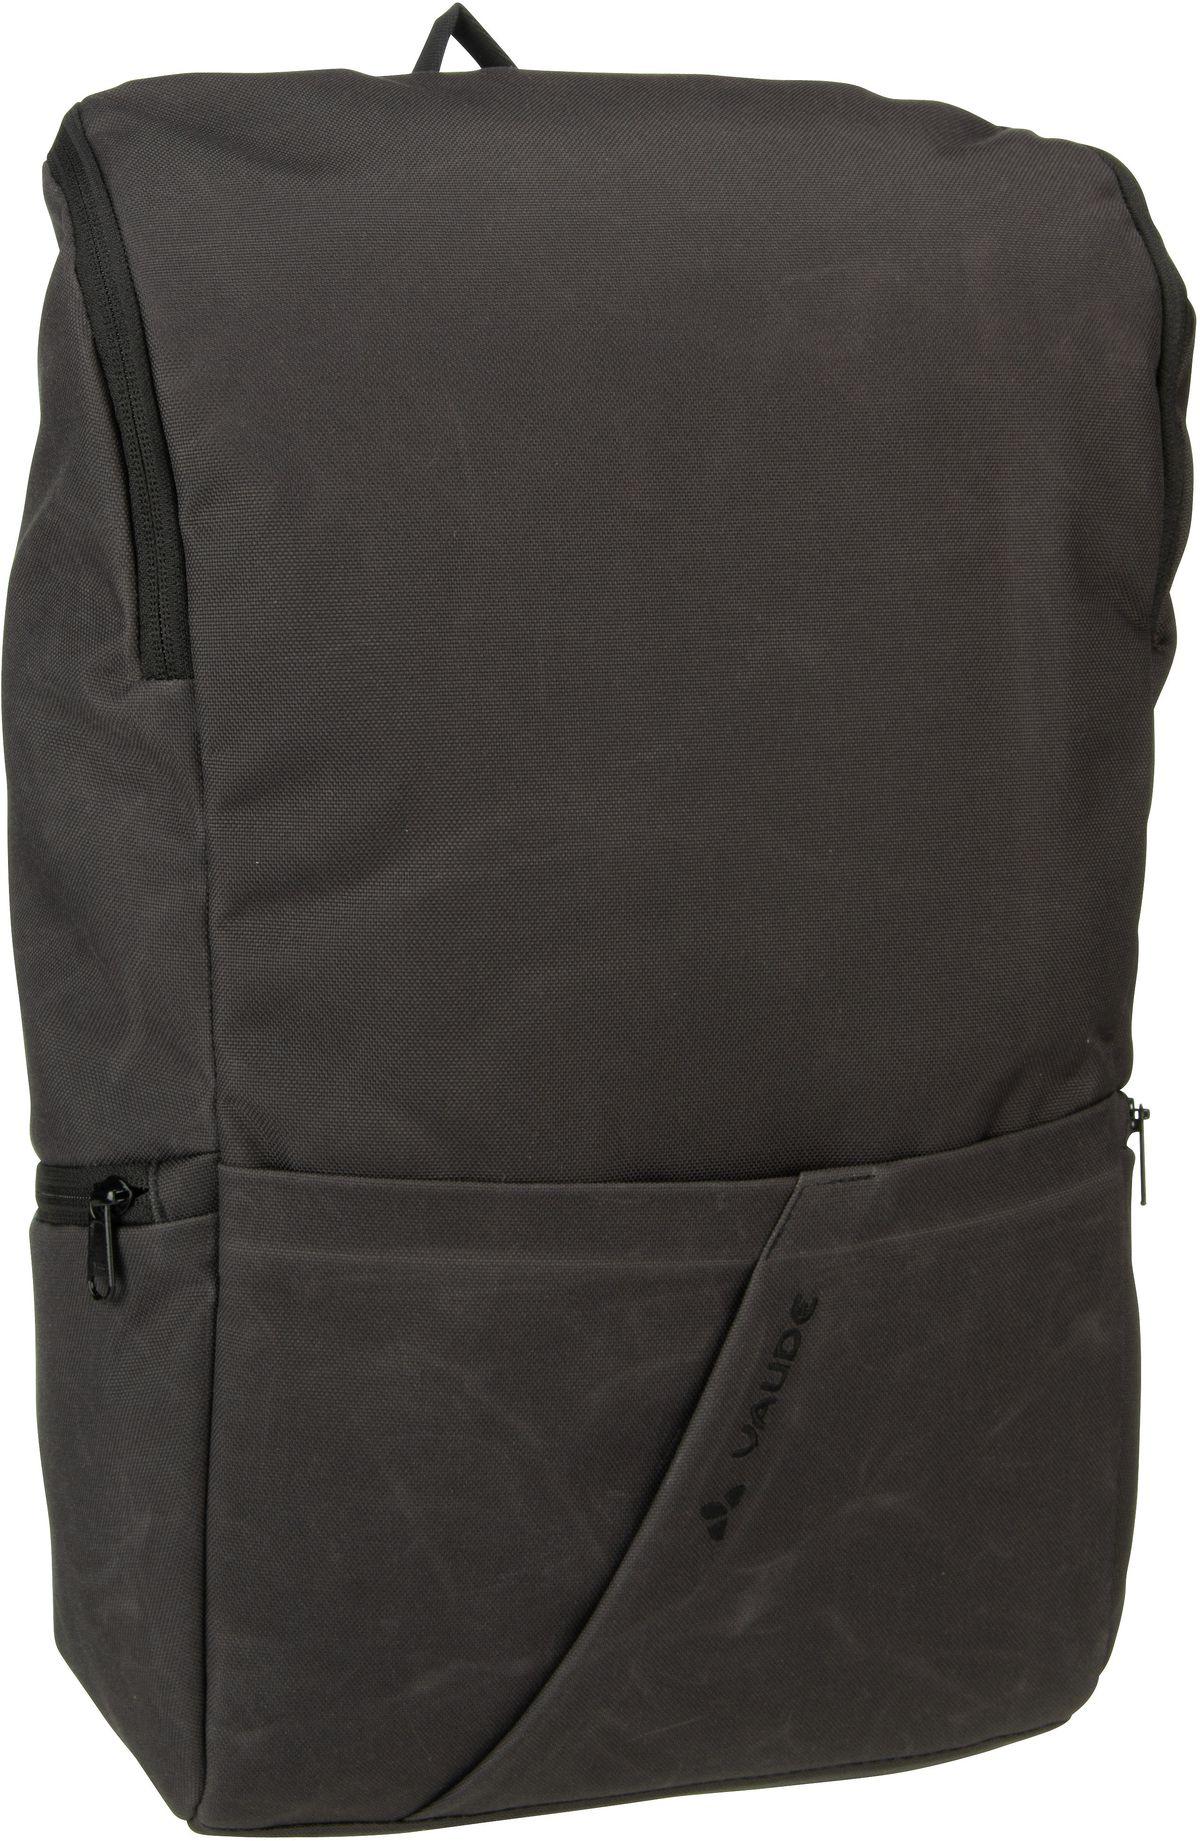 Rucksack / Daypack Aspe Waxed Phantom Black (17 Liter)